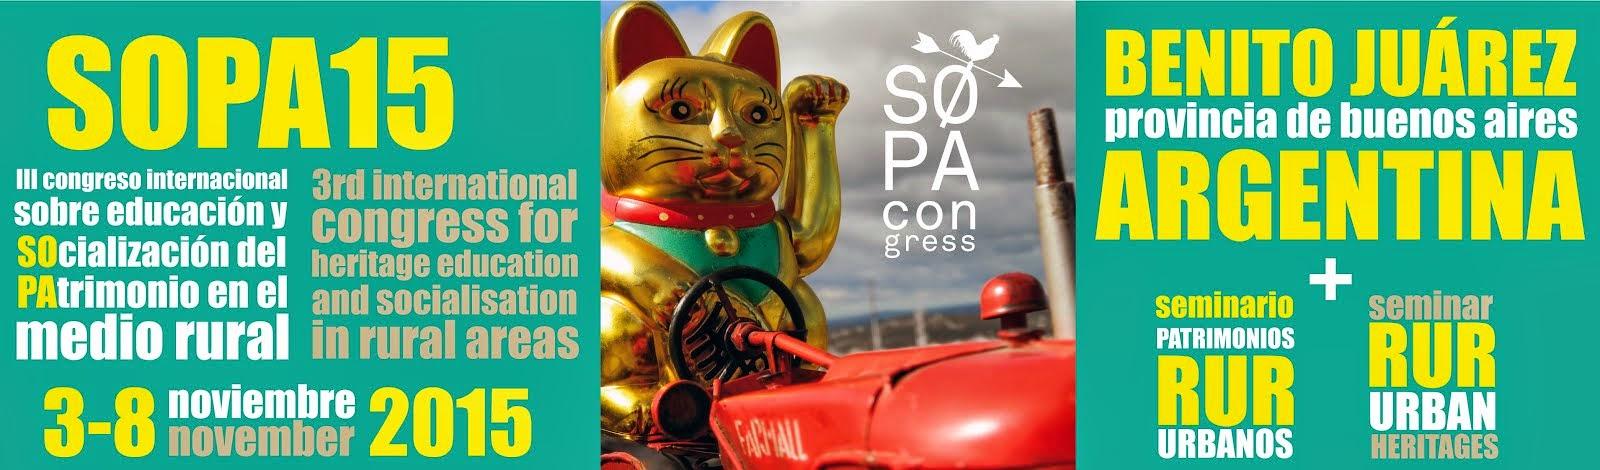 SOPA15